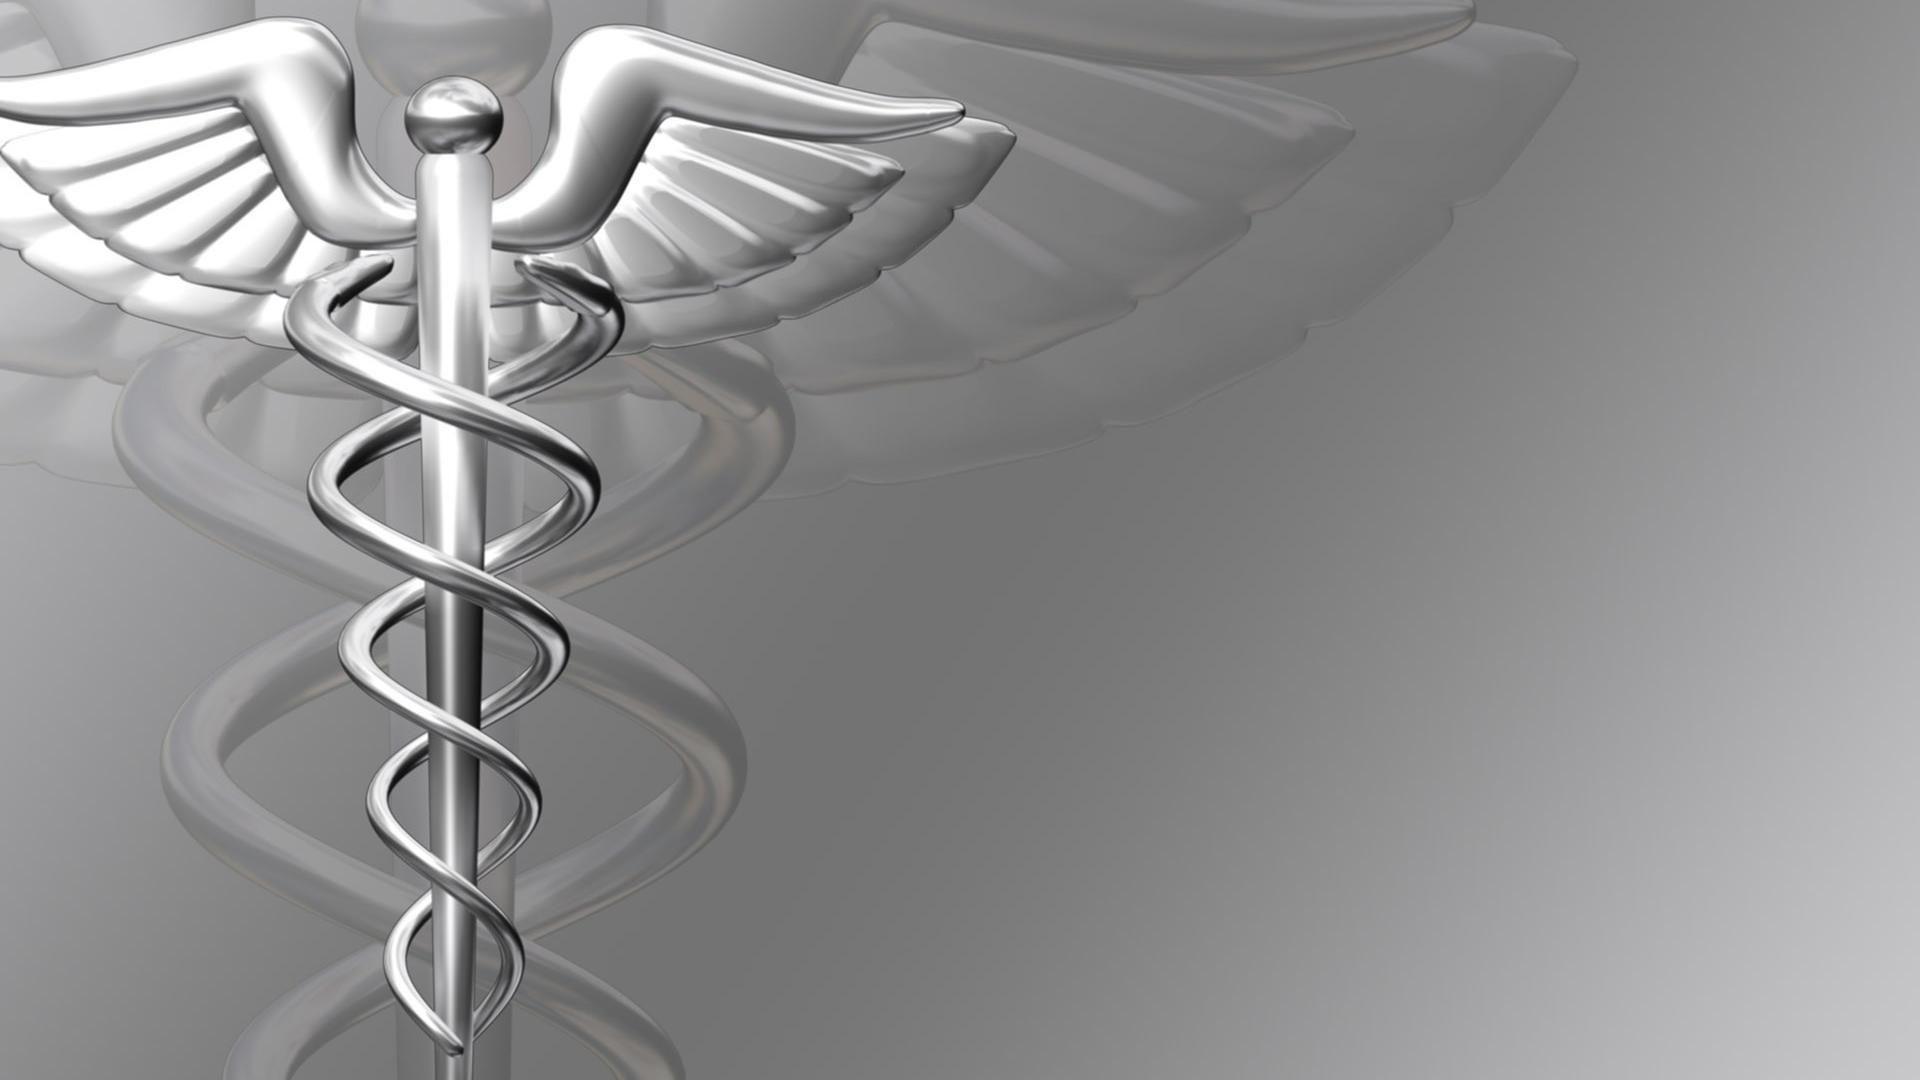 Medical Doctor Wallpaper: Medical Doctor Wallpapers HD